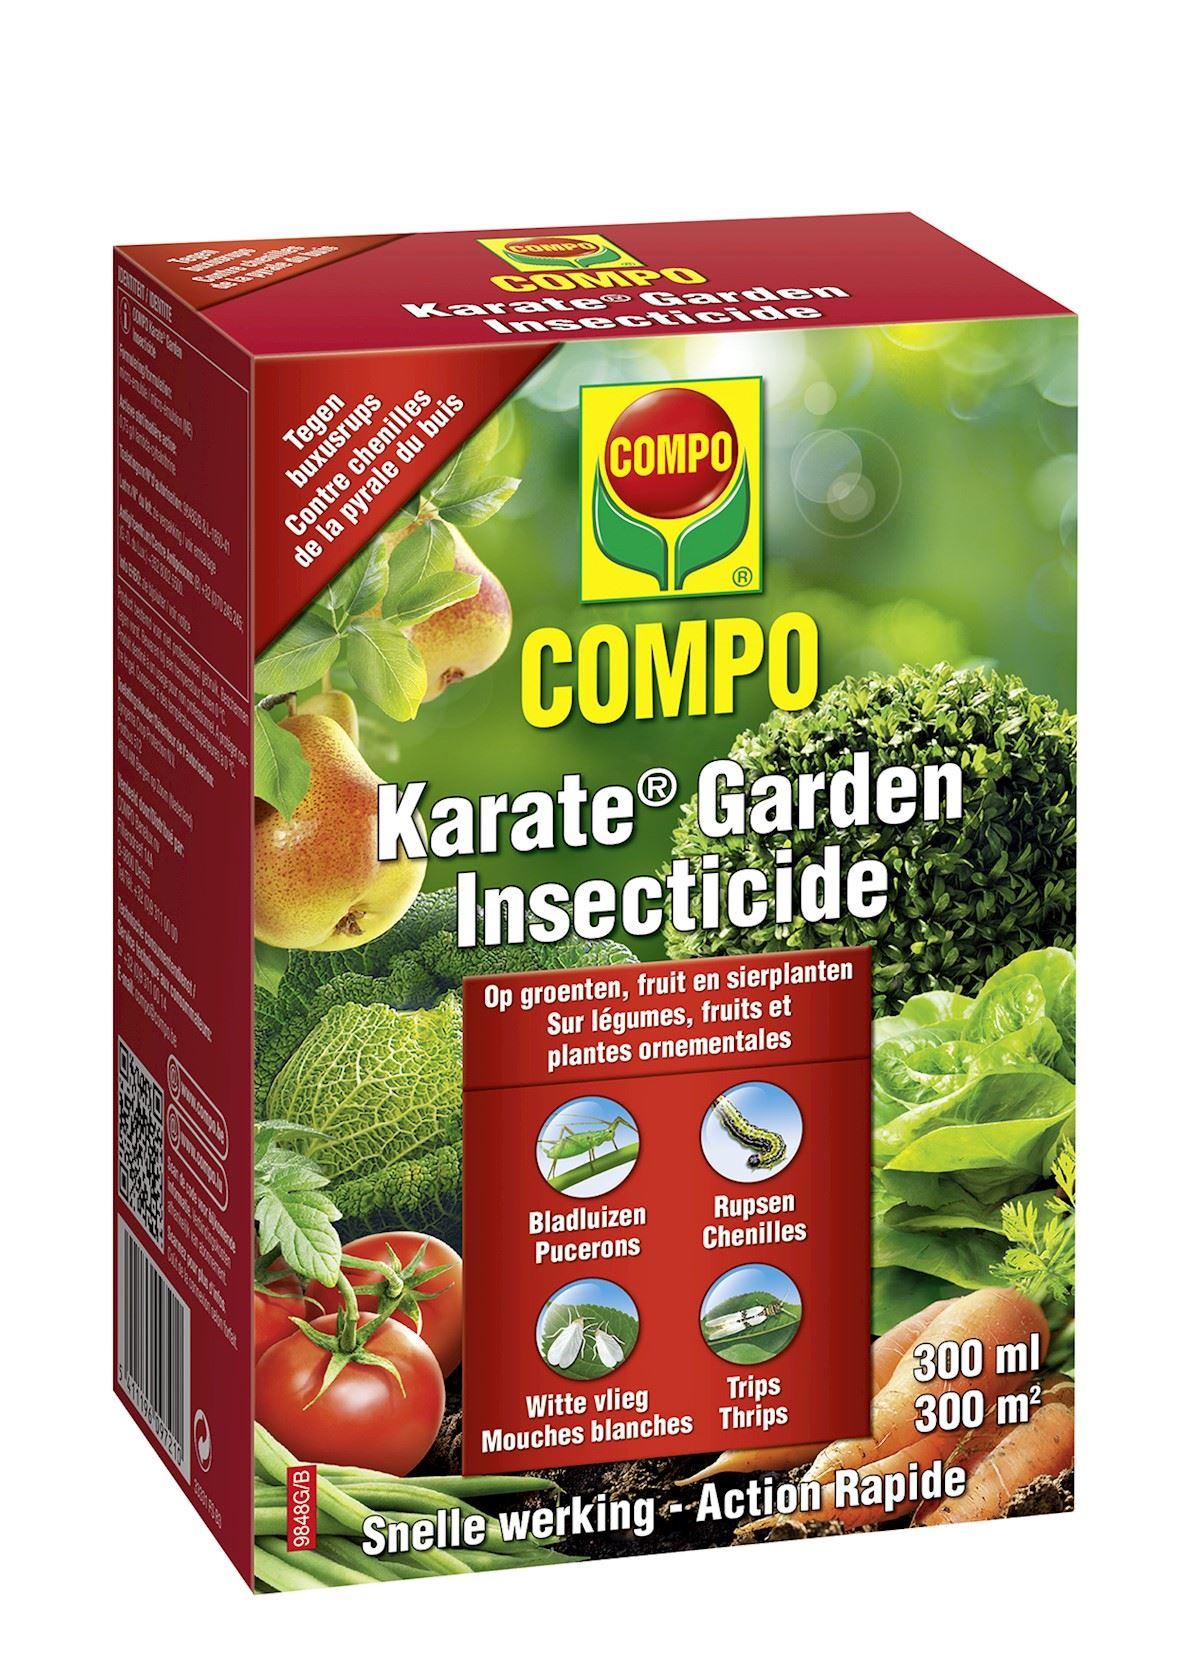 Compo karate garden concentraat - 300ml